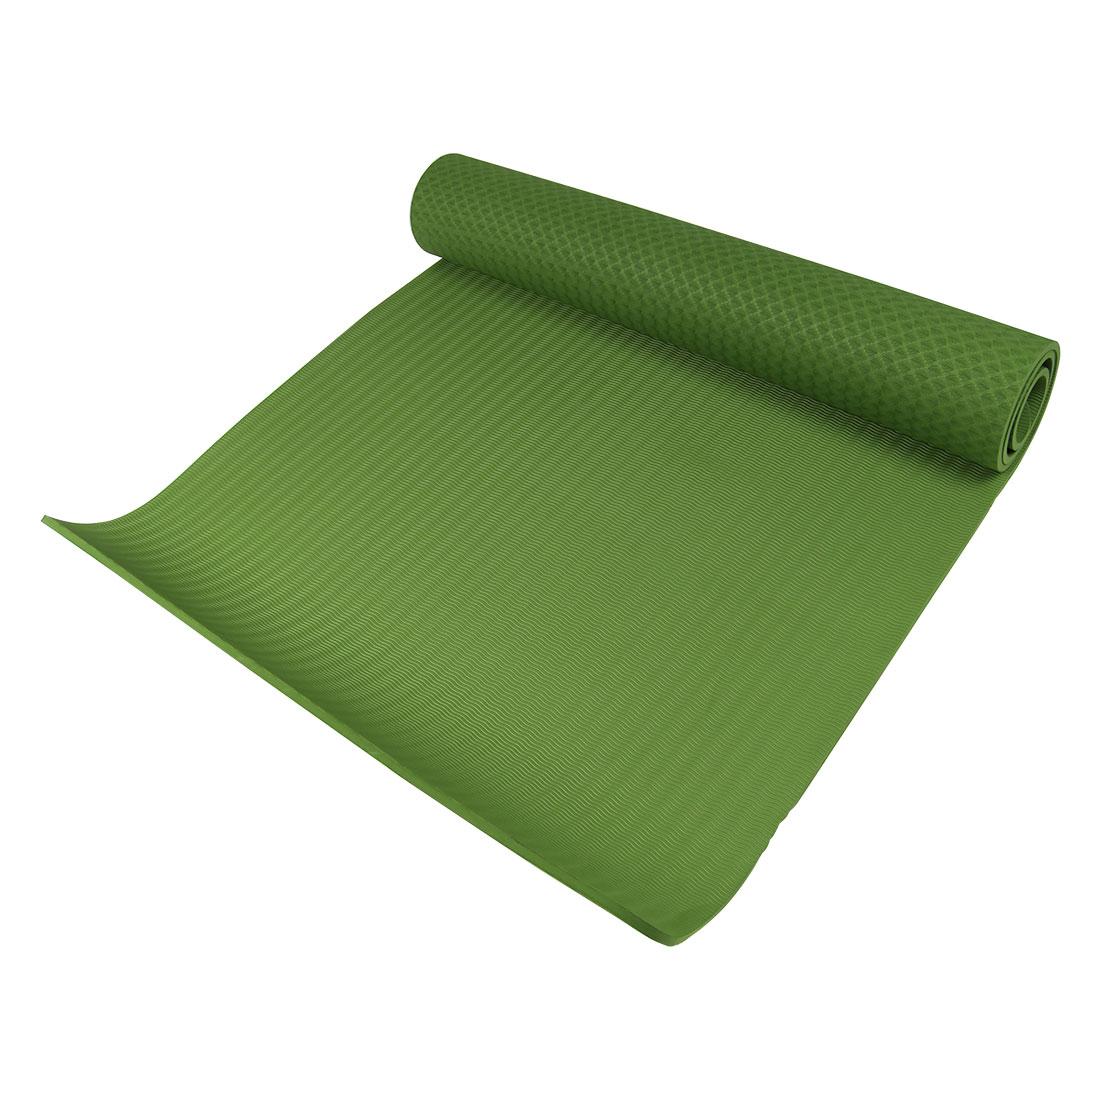 Indoor Gym Exercise Folding Anti Slip Yoga Pilates Practice Mat Cushion Green